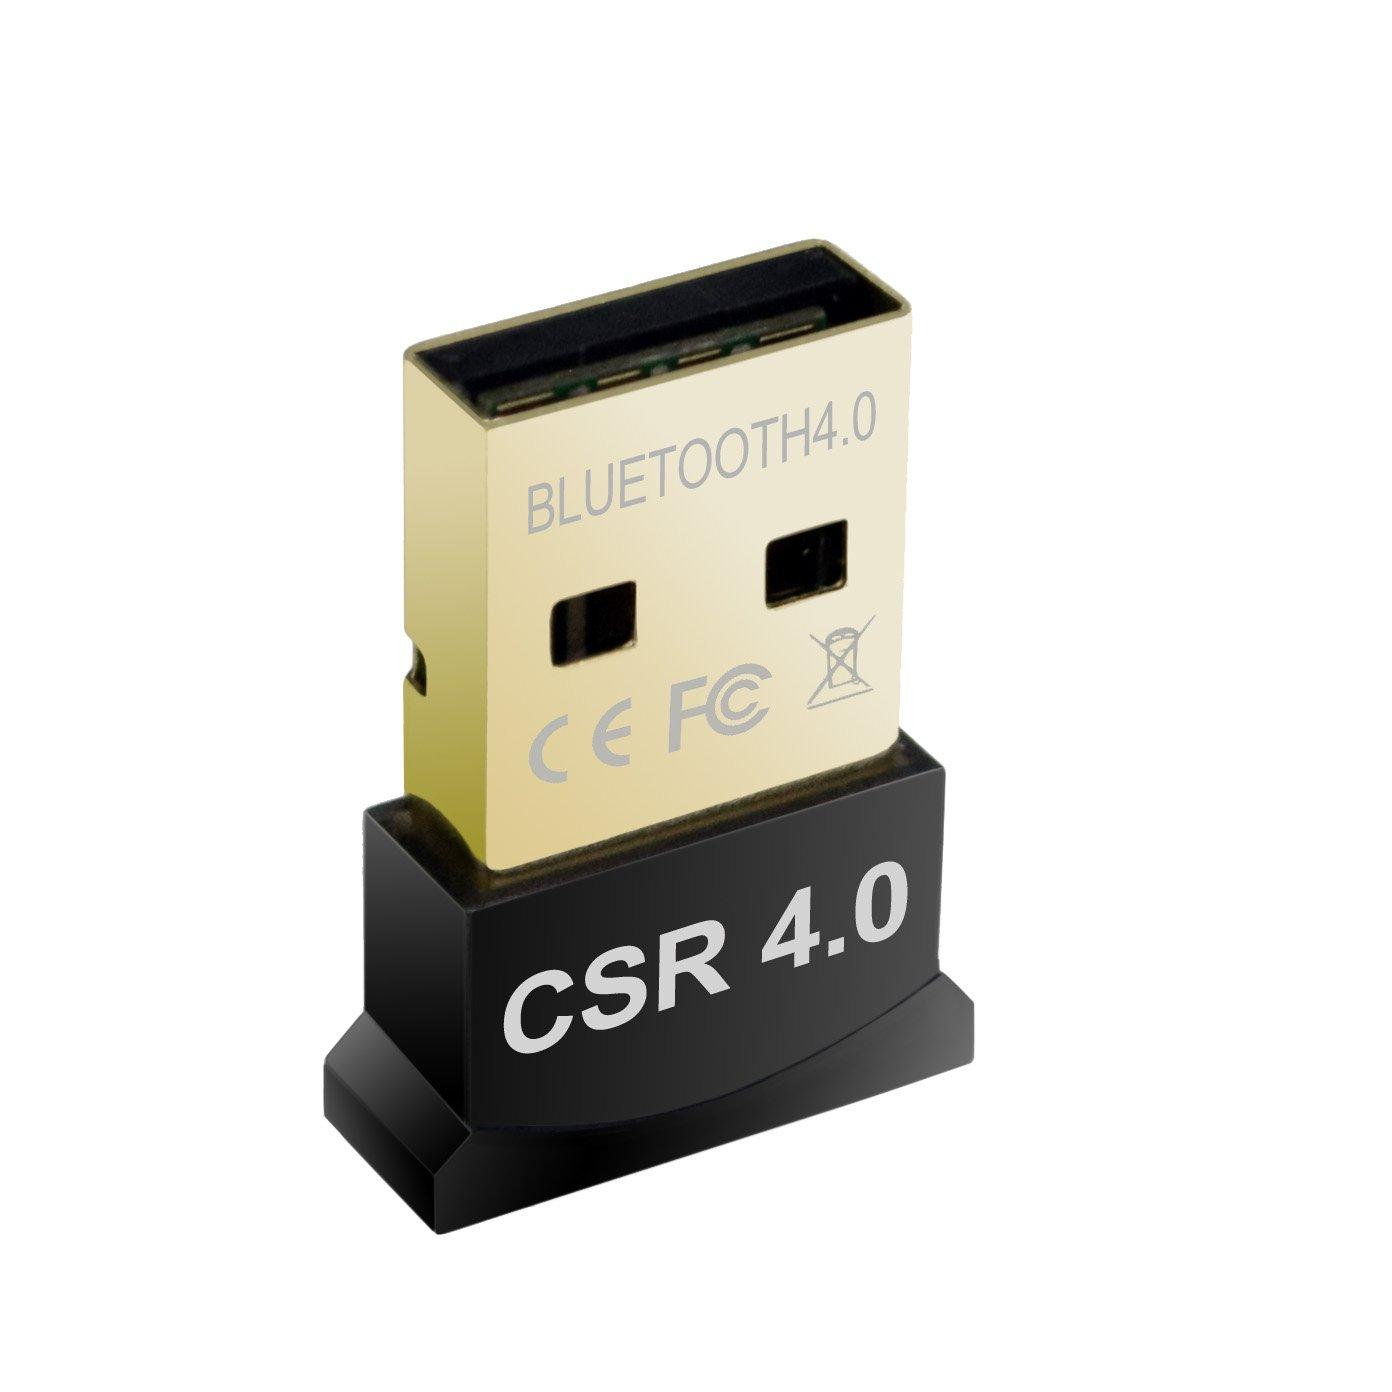 Premiertek Dual Mode Bluetooth V4.0 USB Adapter with Low Energy Technology for Notebook Desktop Raspberry Pi (BT-400_V2)